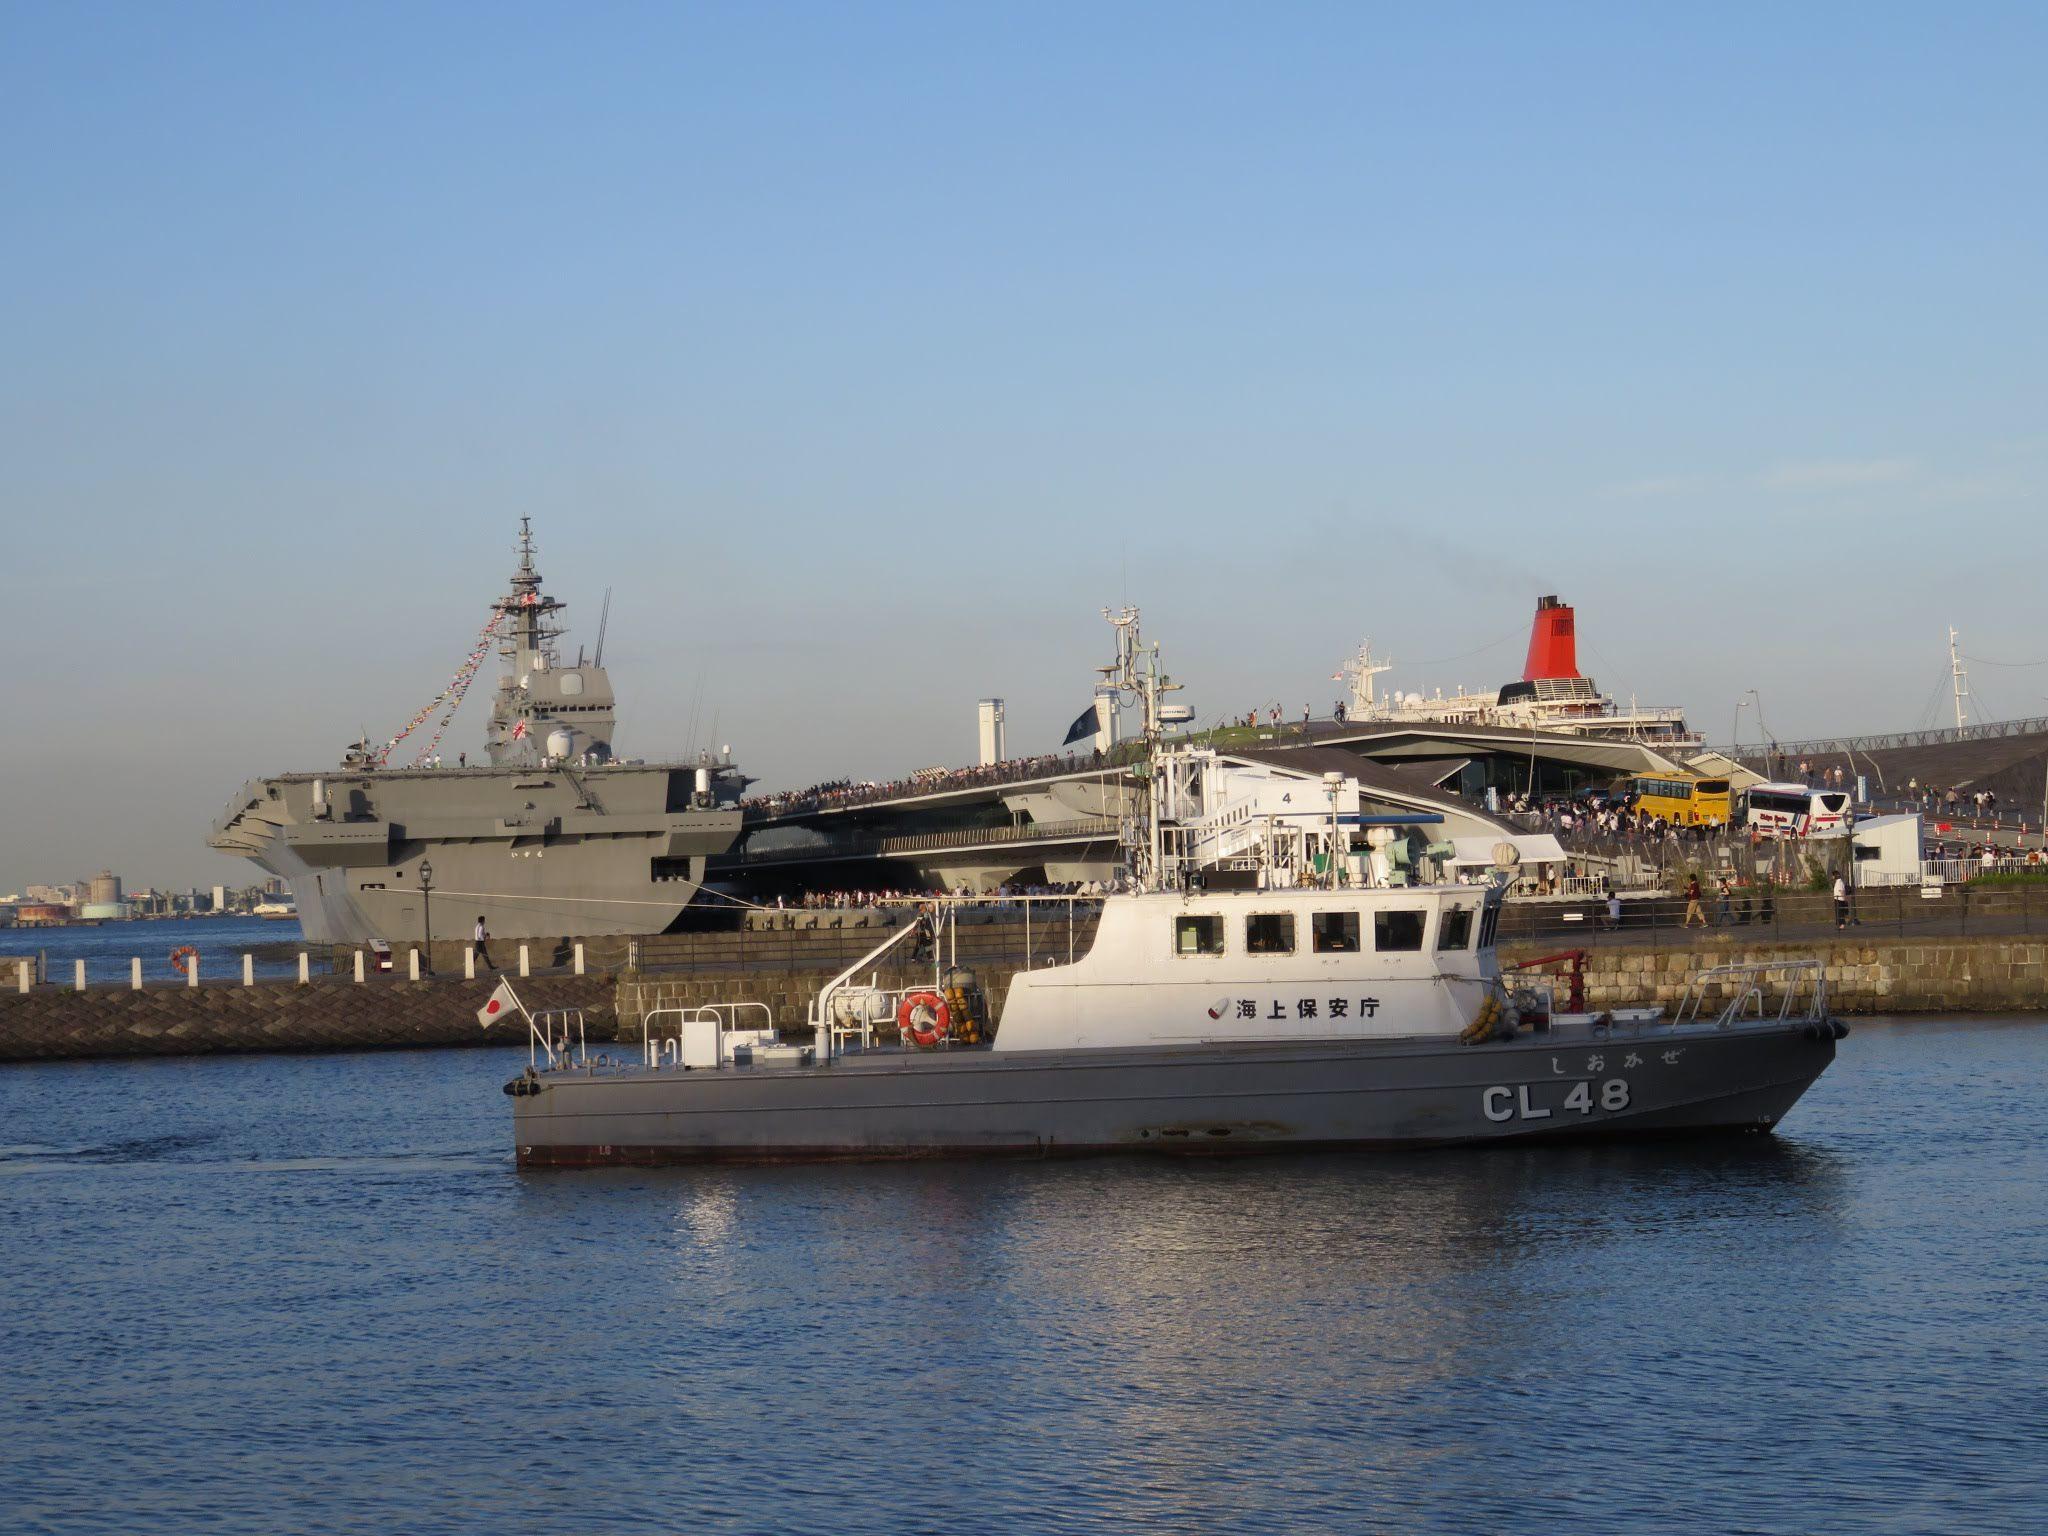 FLEETWEEK2019横浜 - 護衛艦「いずも」一般公開_a0057402_11385809.jpg